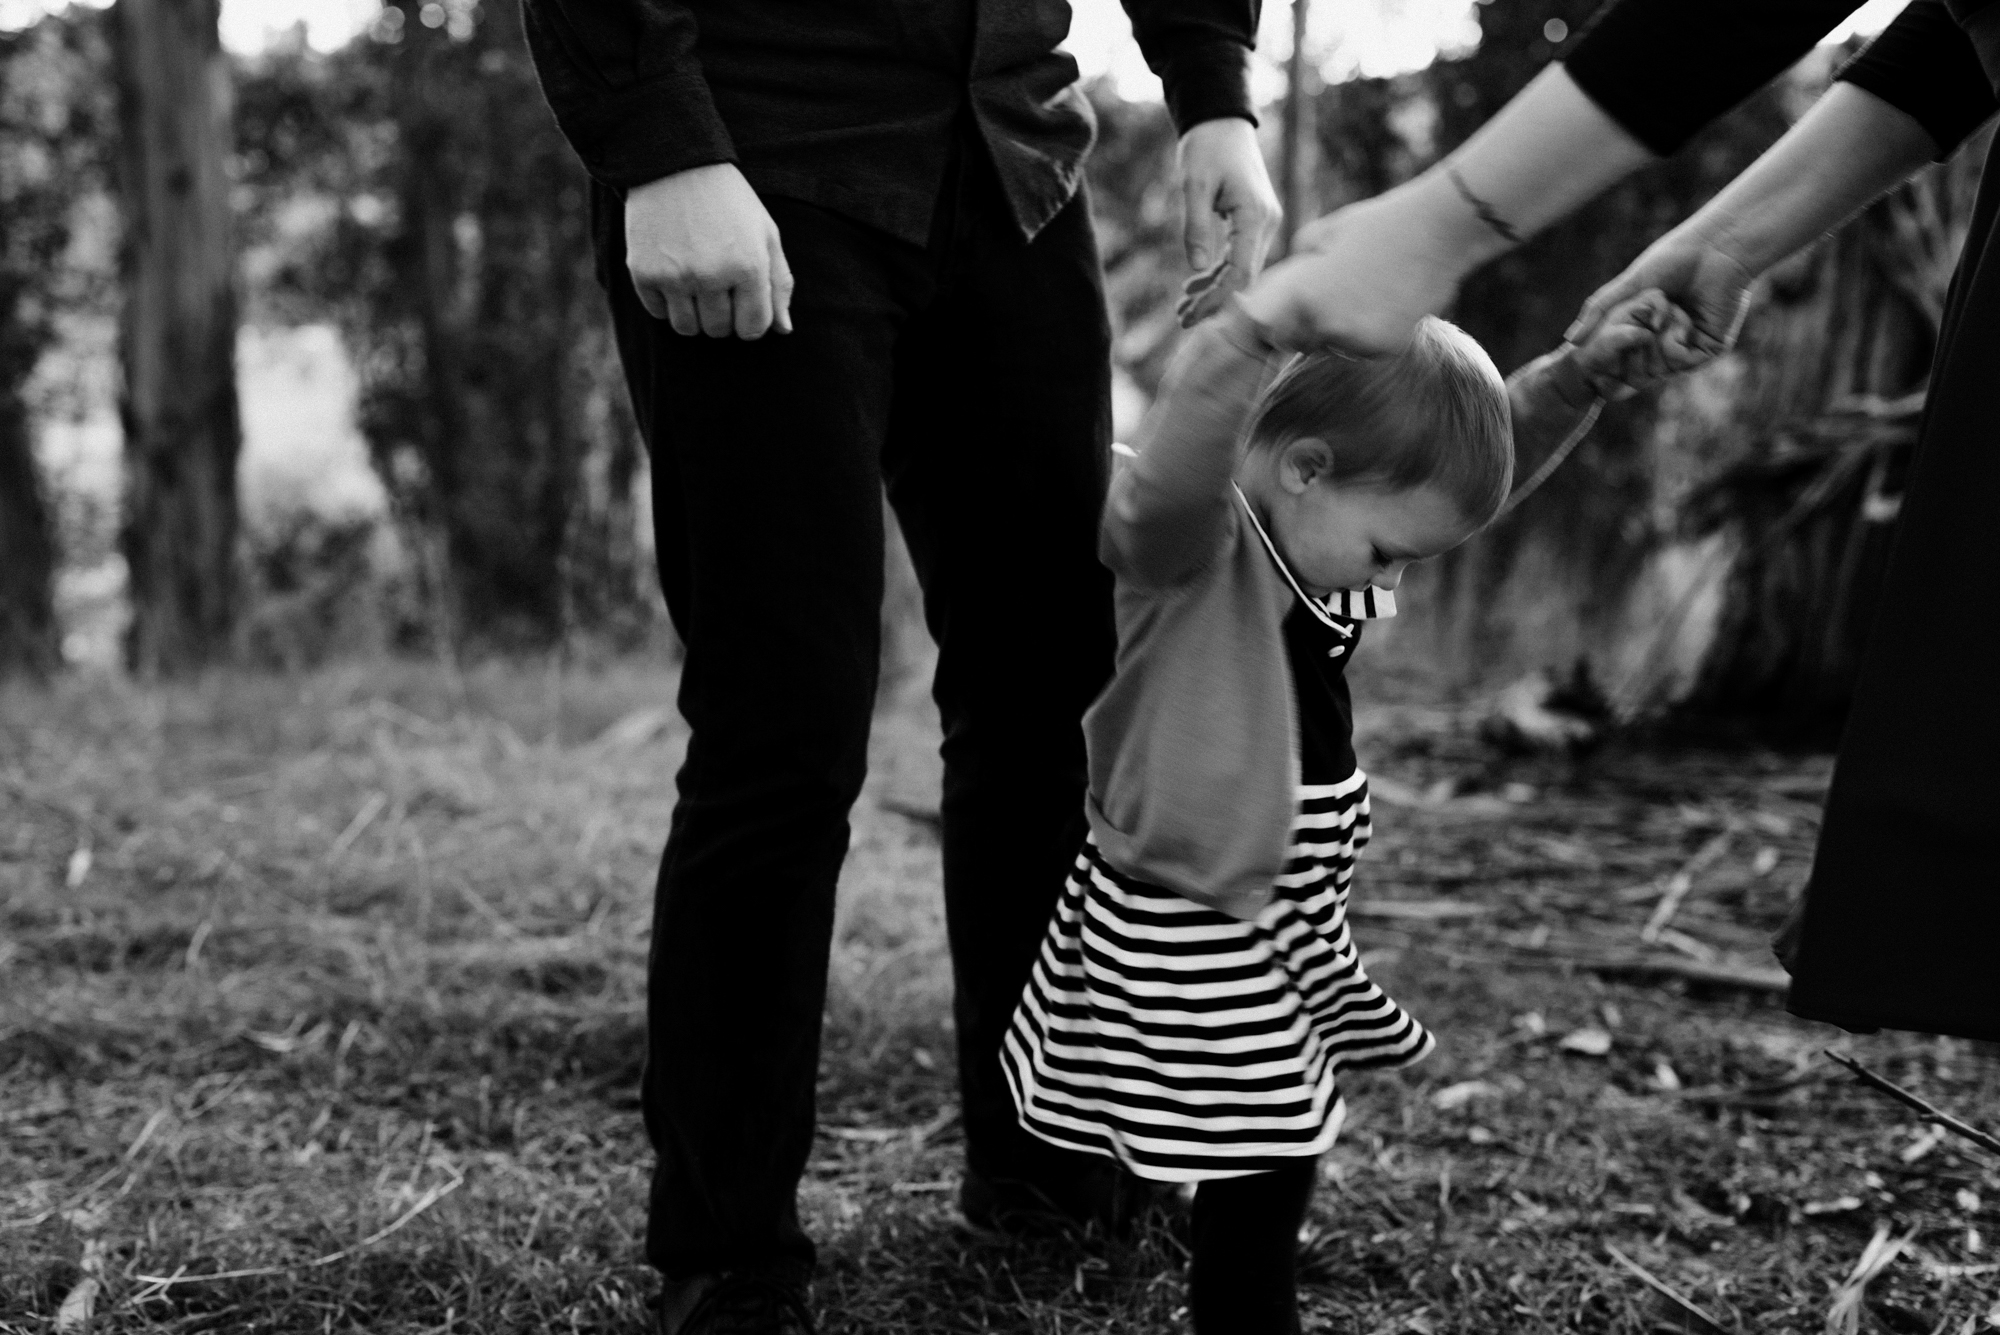 Family dance party - family portrait photography by Caroline Alexander